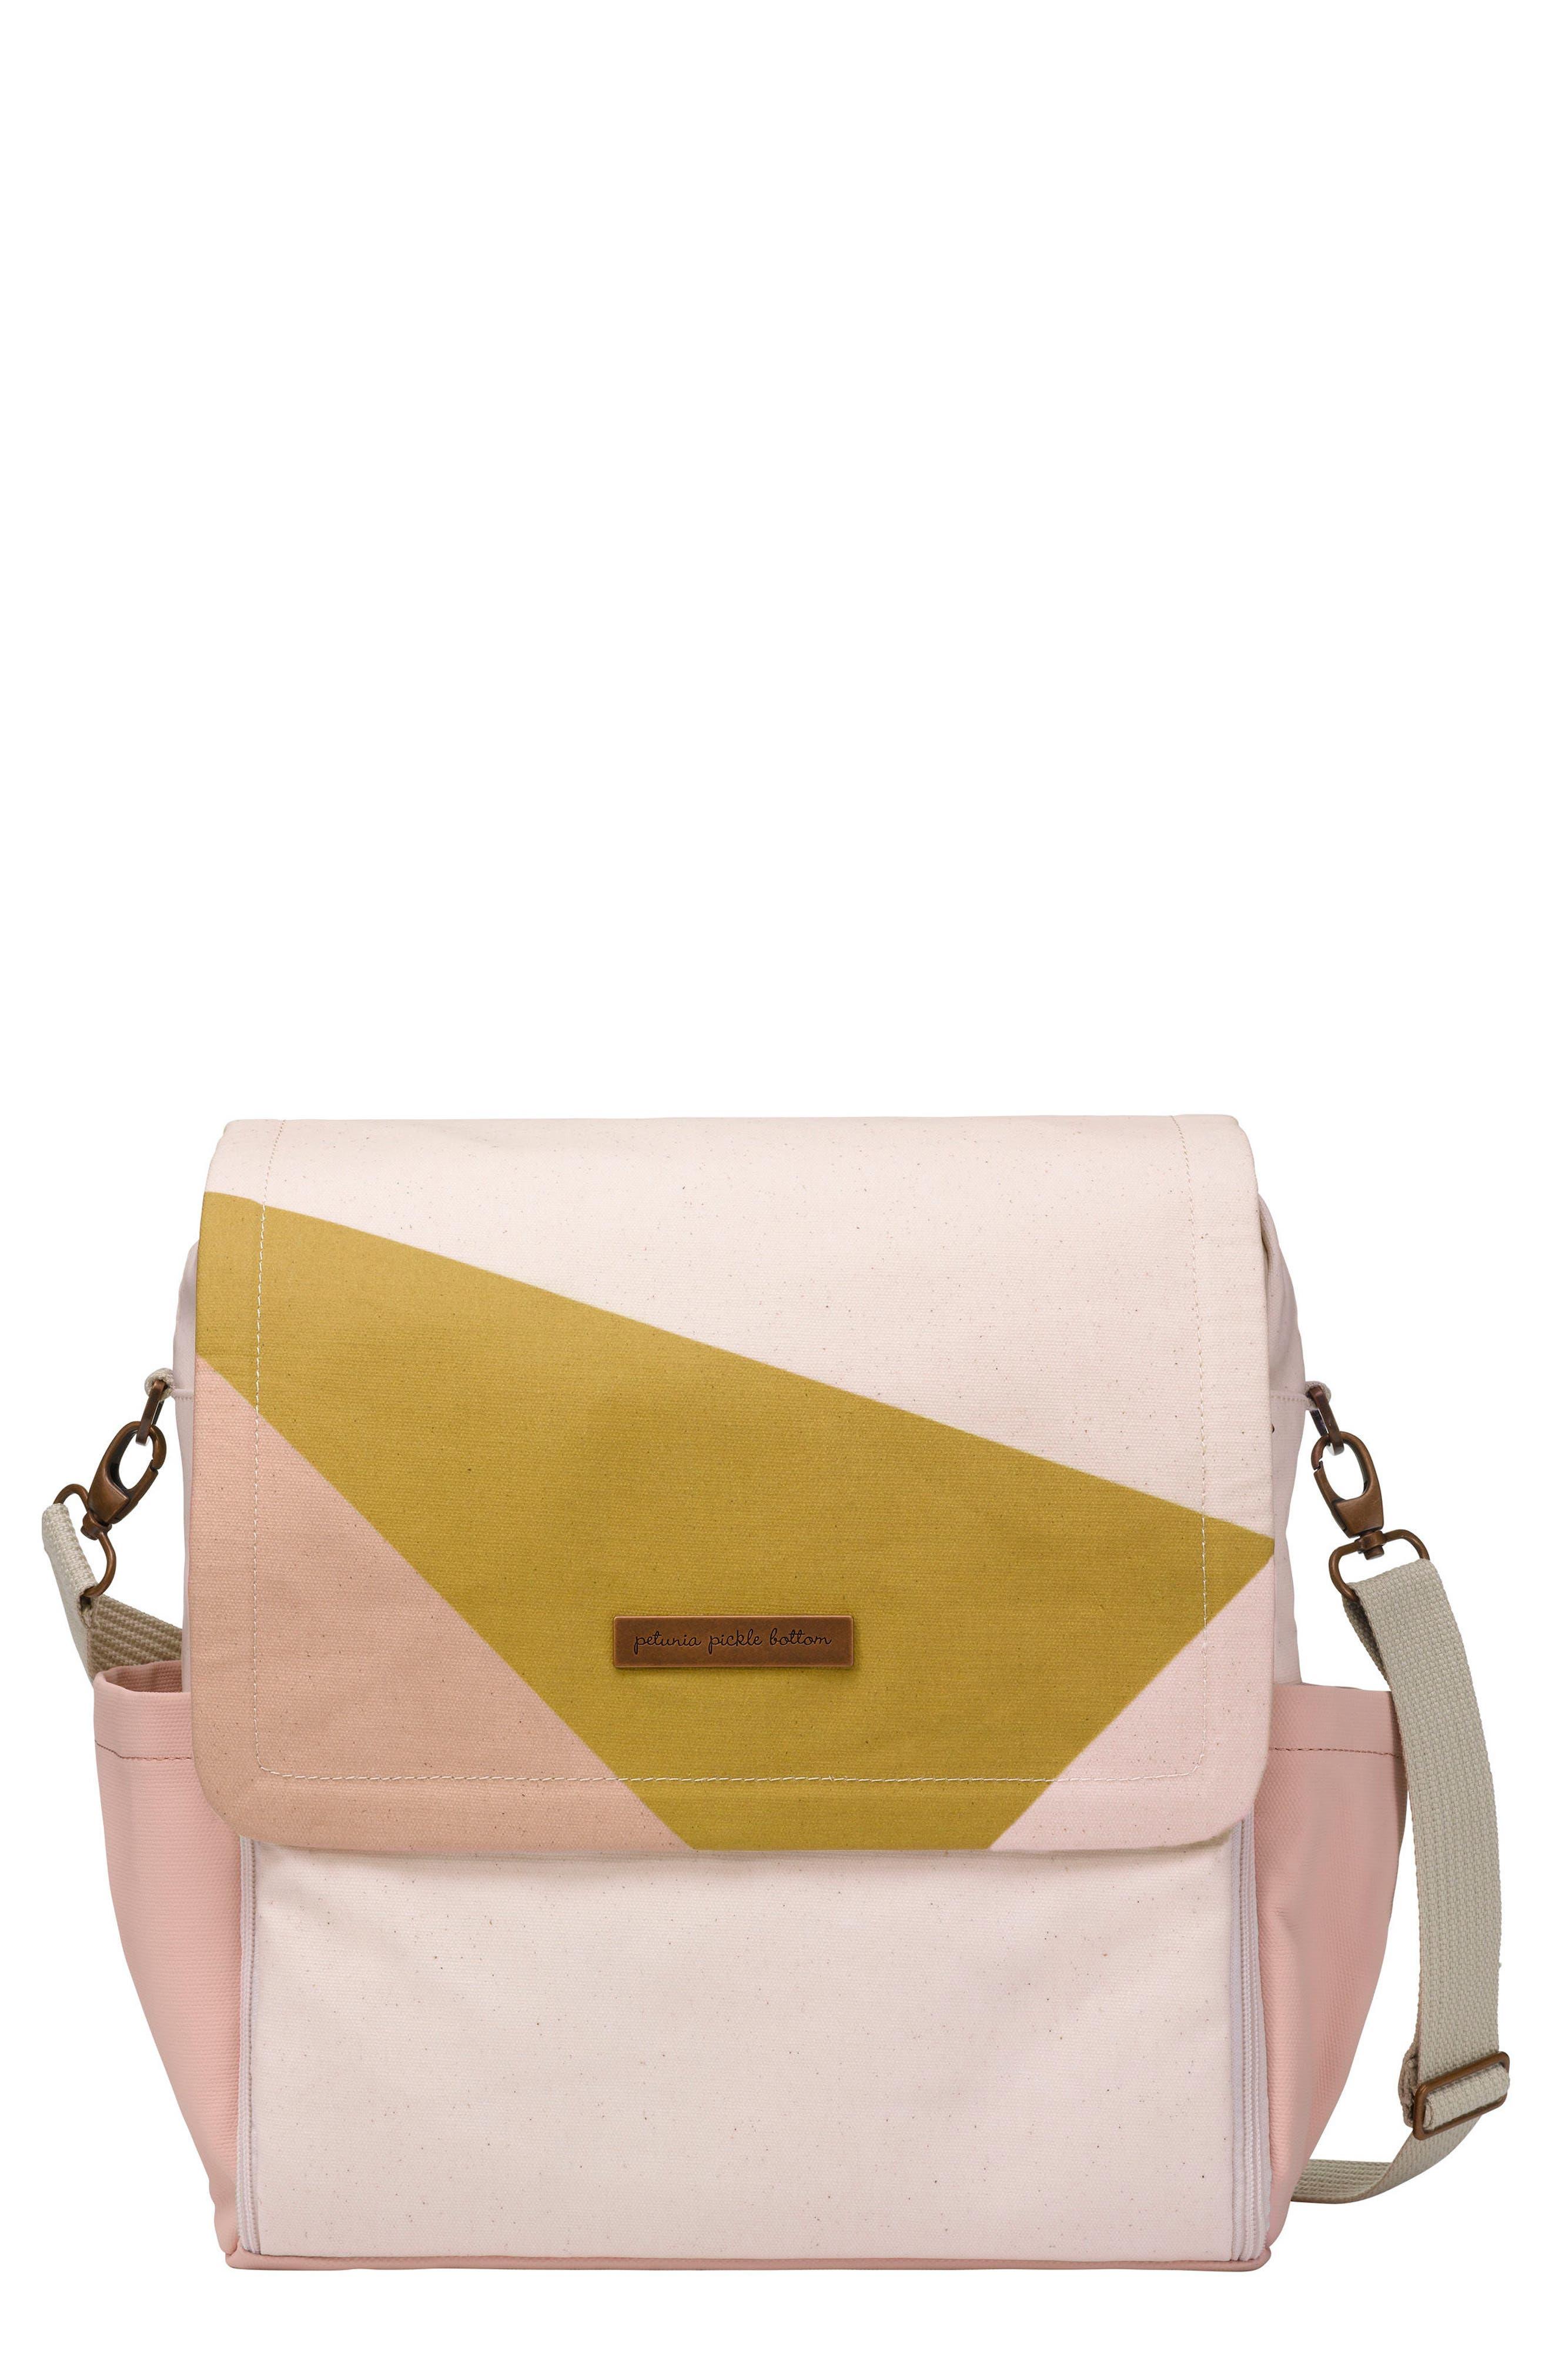 Alternate Image 1 Selected - Petunia Pickle Bottom Boxy Backpack Diaper Bag